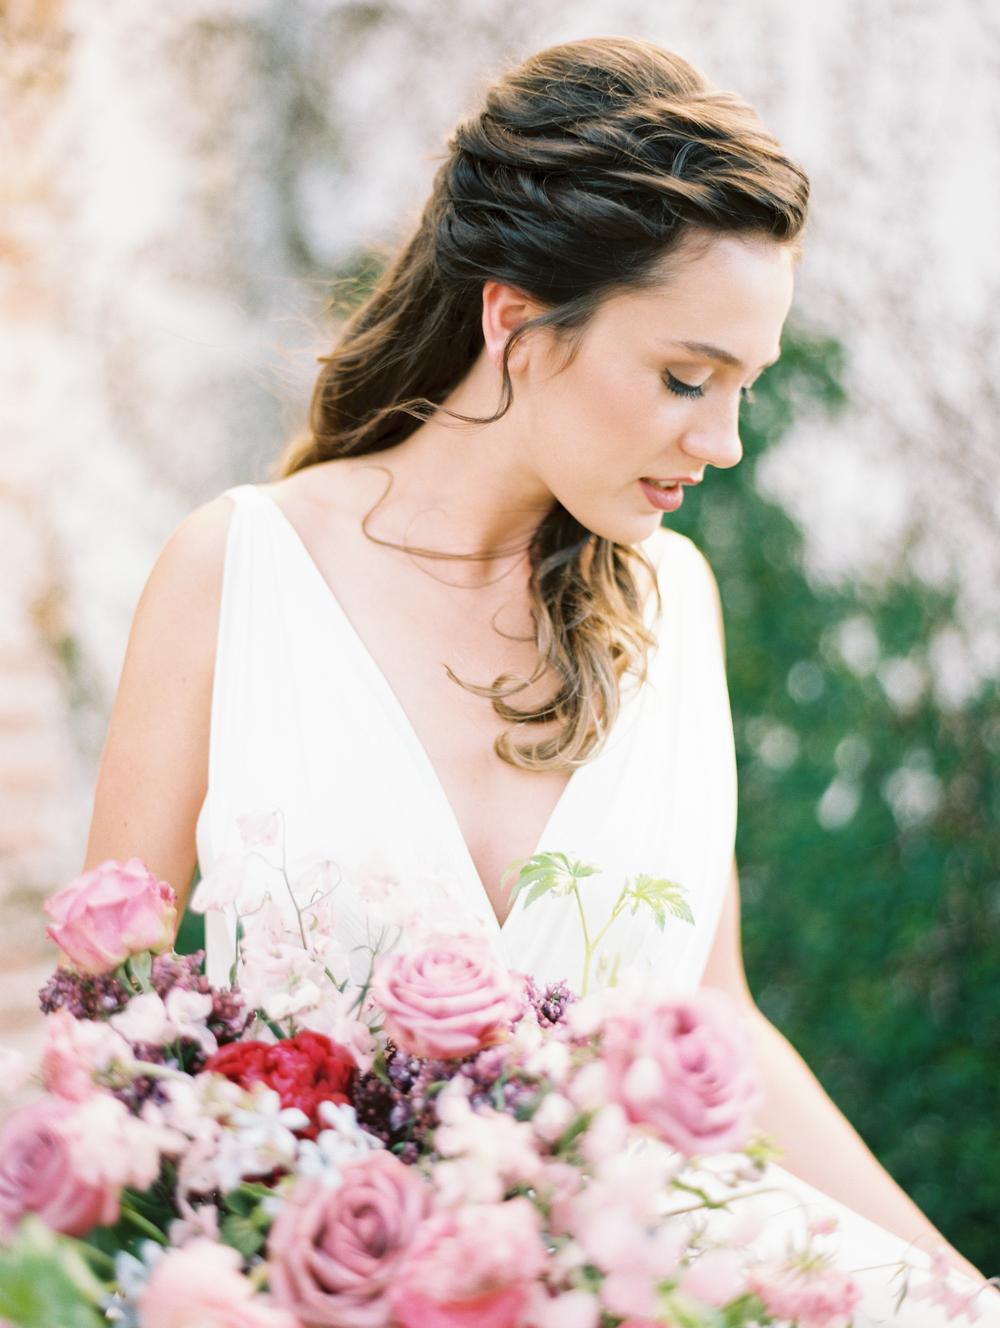 kristin-la-voie-photography-Austin-Wedding-Photographer-44 (1).jpg